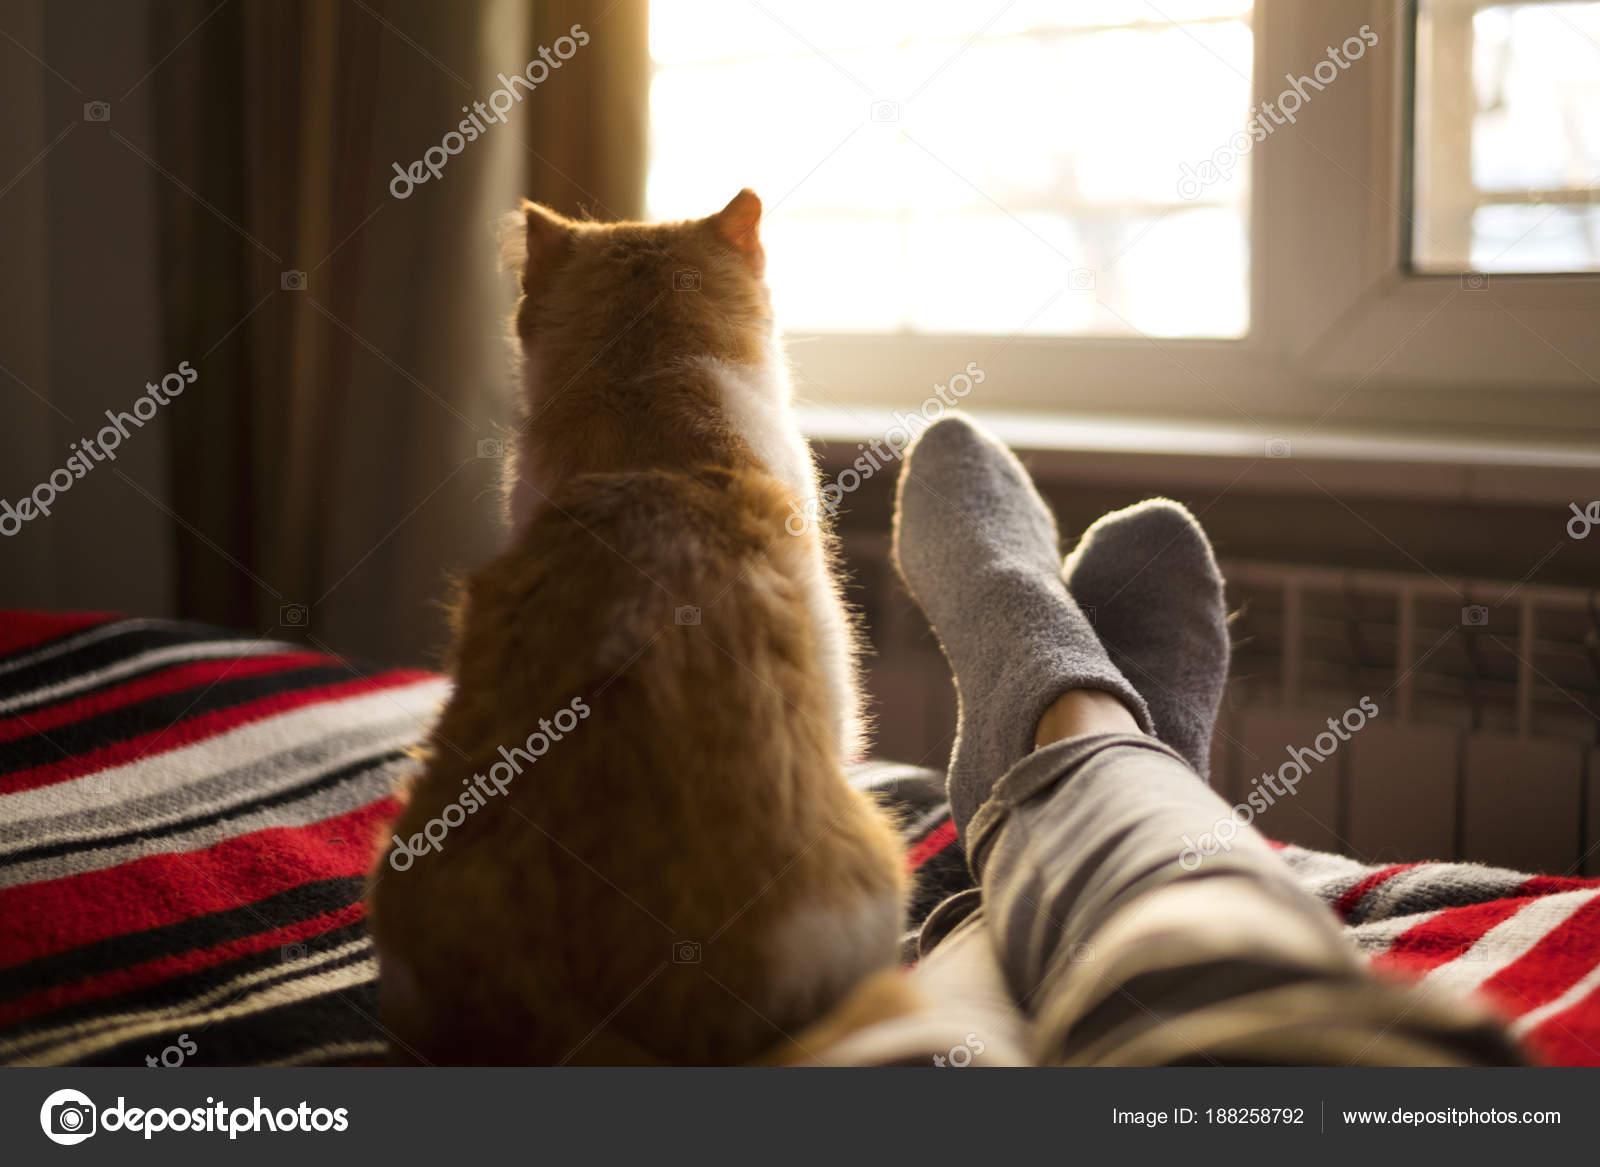 f7c2fe49d3f6 Ψέματα και ξεκούραση στο κρεβάτι με την γάτα απέναντι από το παράθυρο σε  μια ηλιόλουστη ημέρα